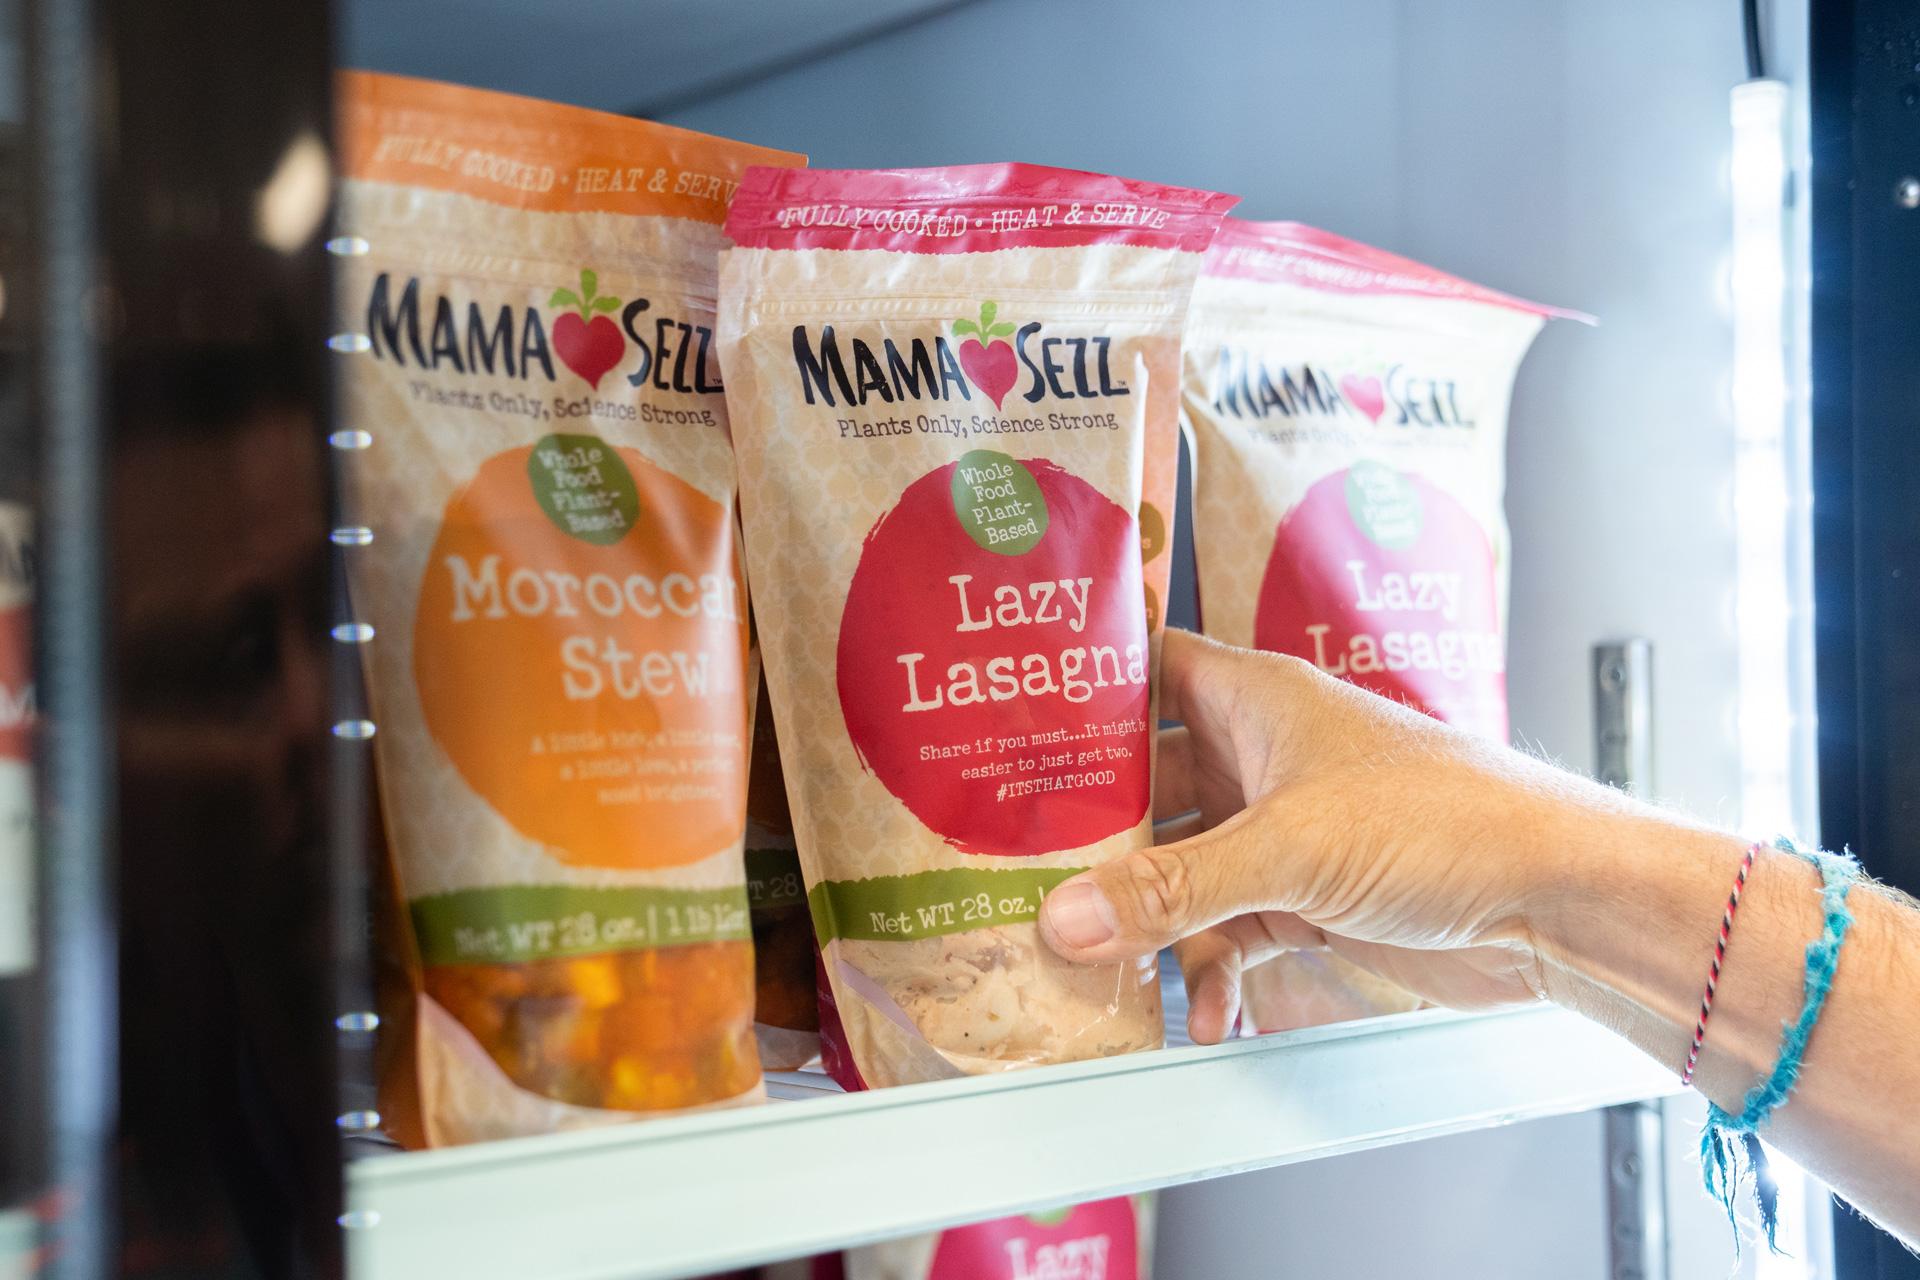 Bags of MamaSezz food on refrigerator shelf